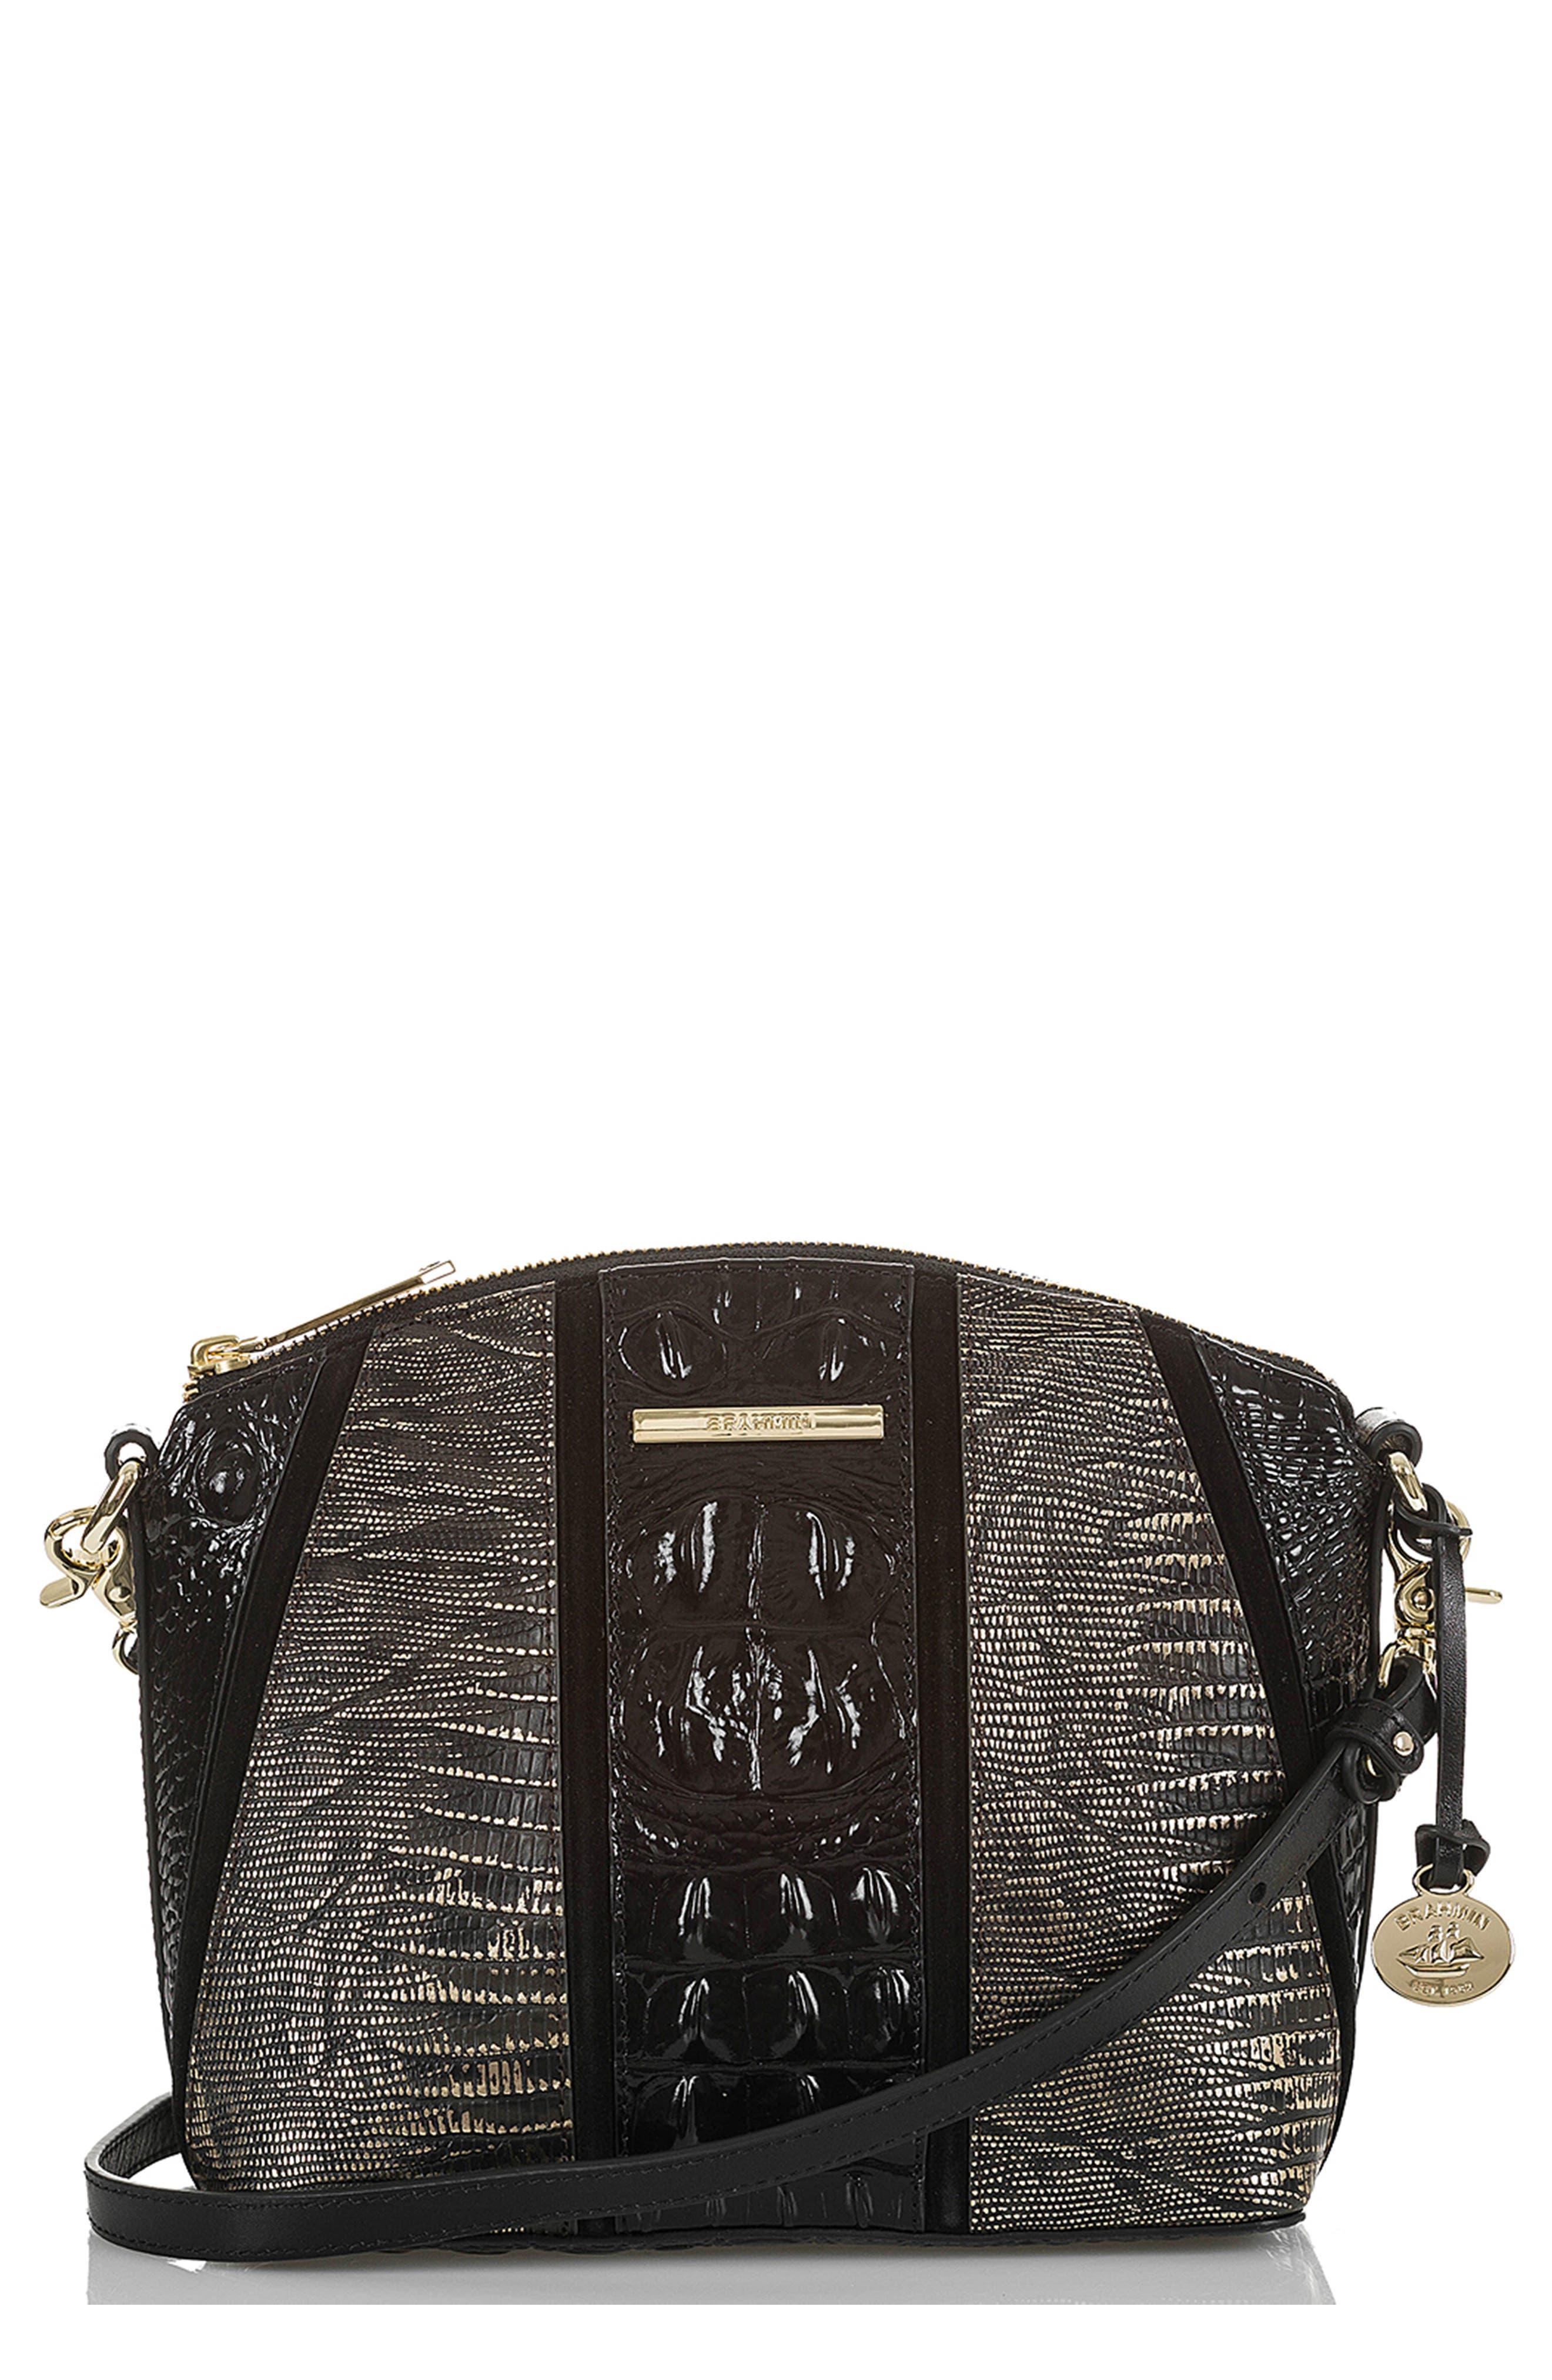 BRAHMIN, Mini Duxbury Embossed Leather Crossbody Bag, Main thumbnail 1, color, 028